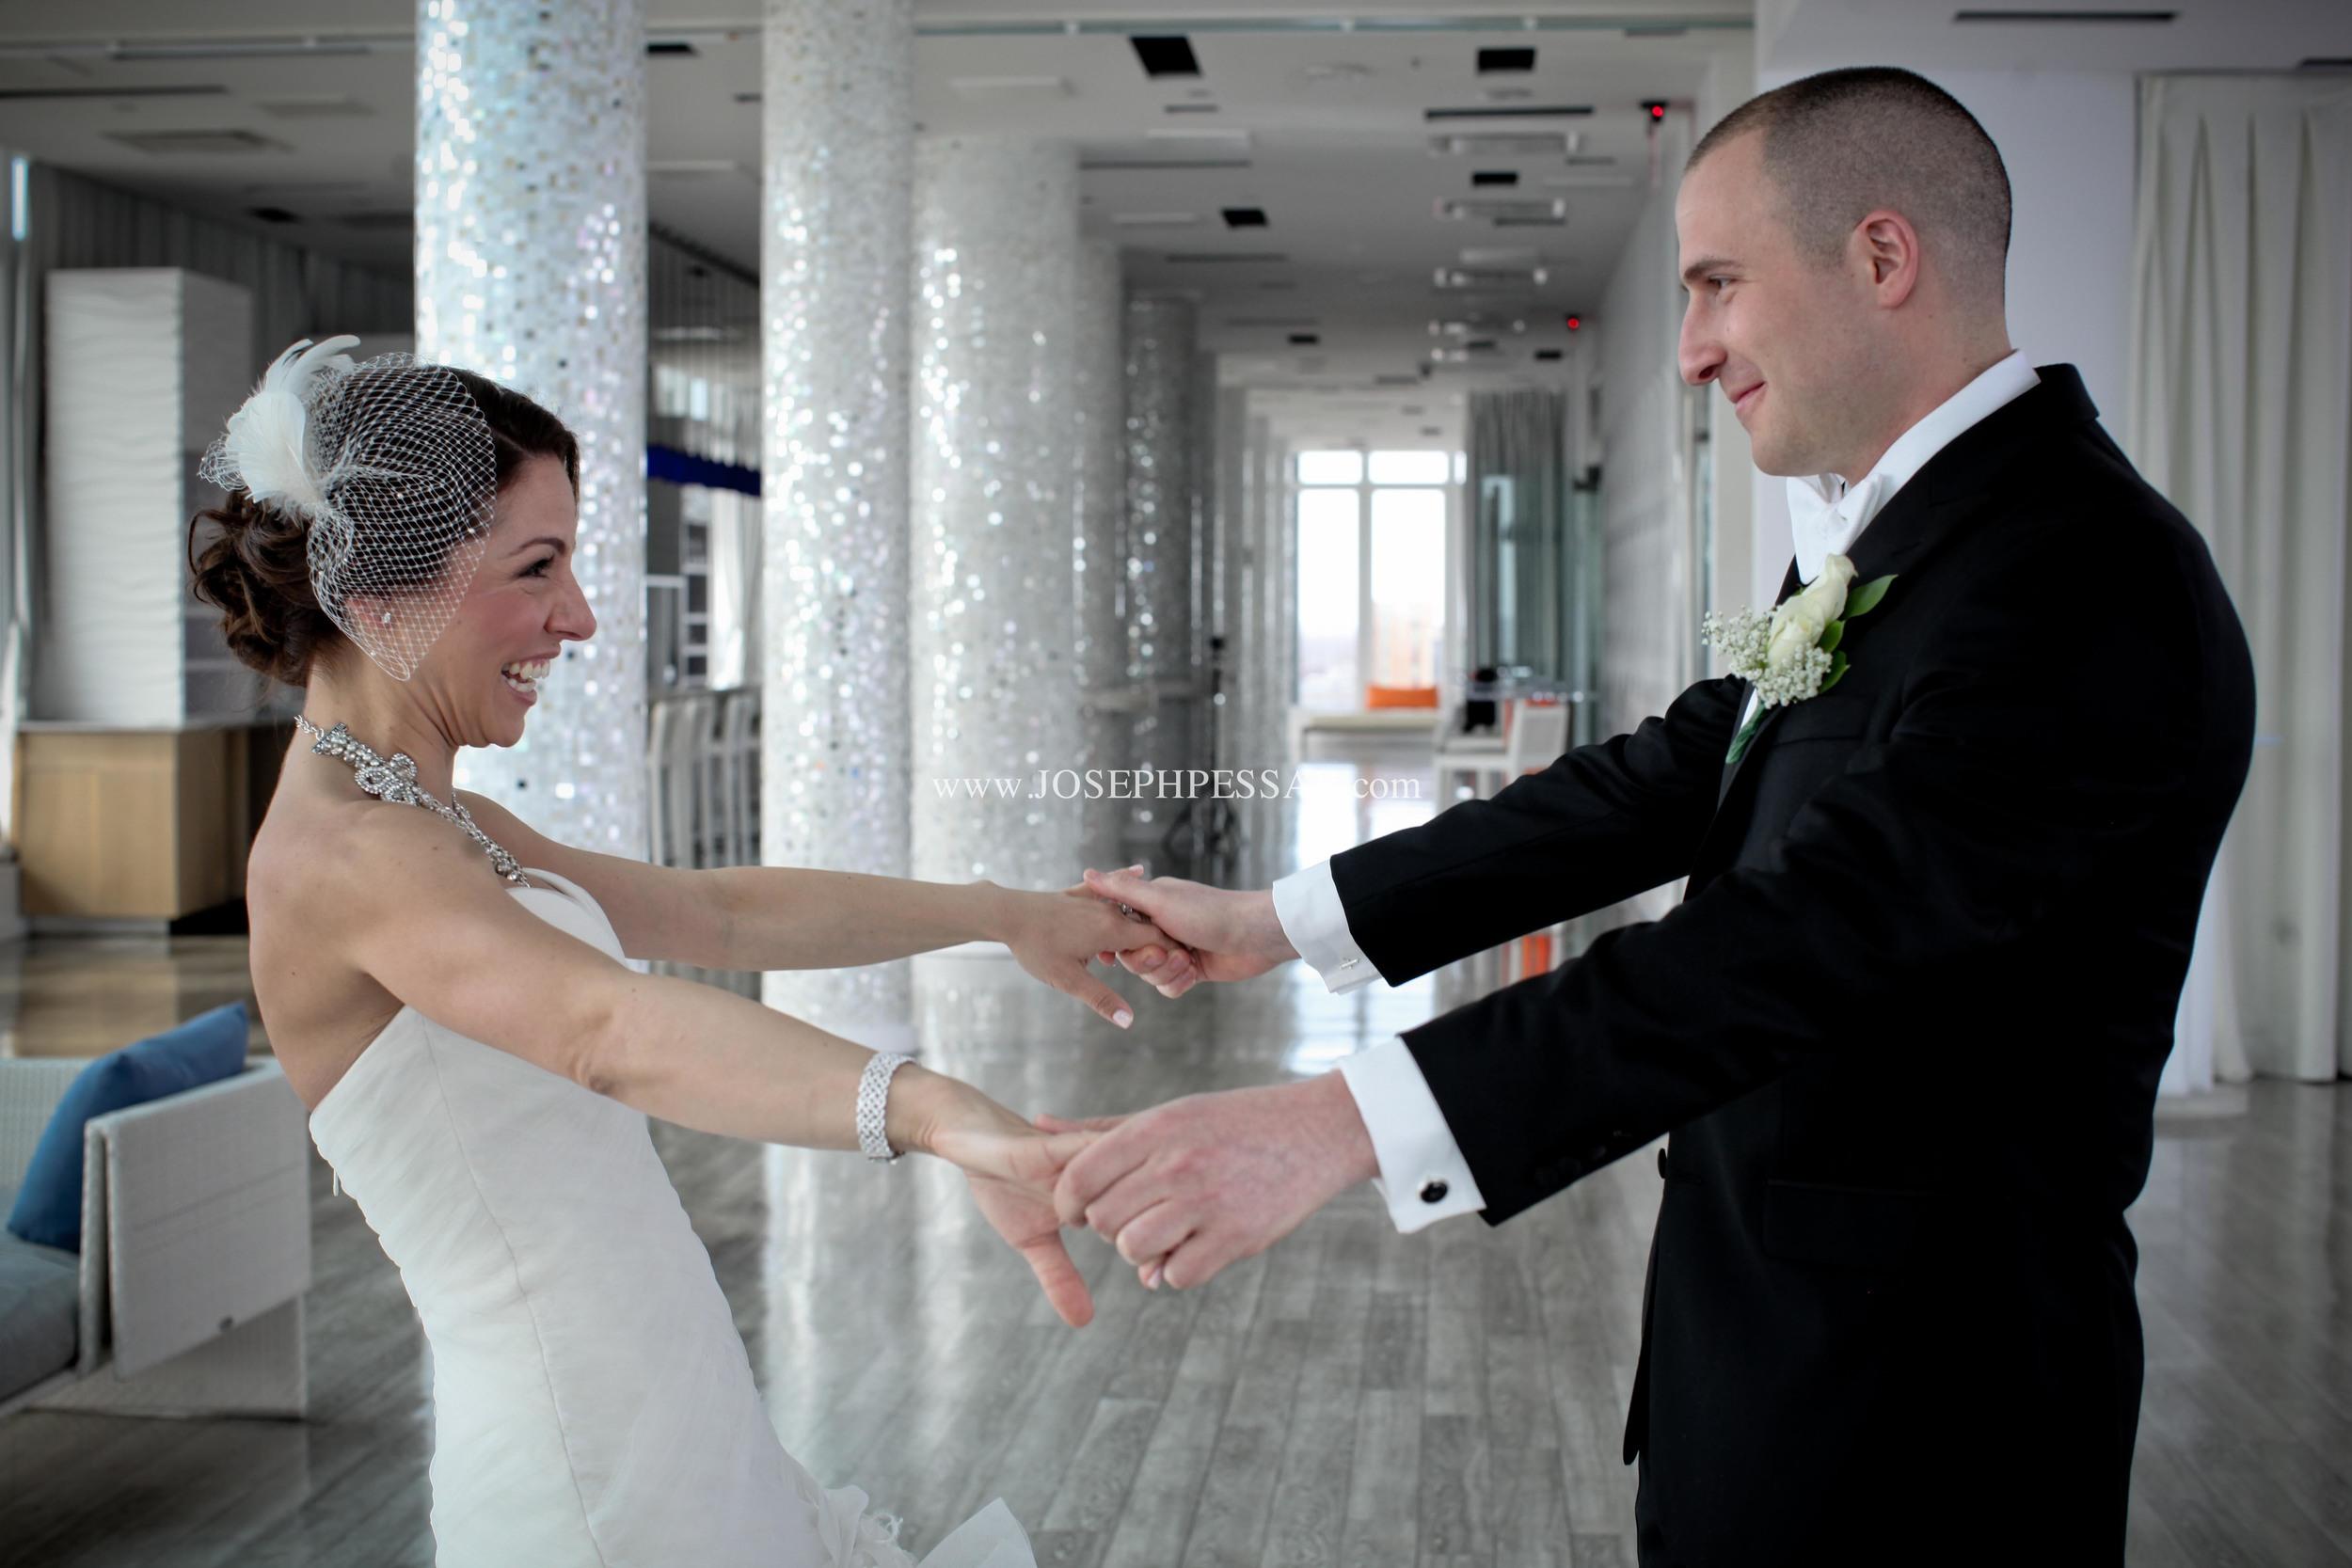 nyc_wedding_photographer0017.jpg